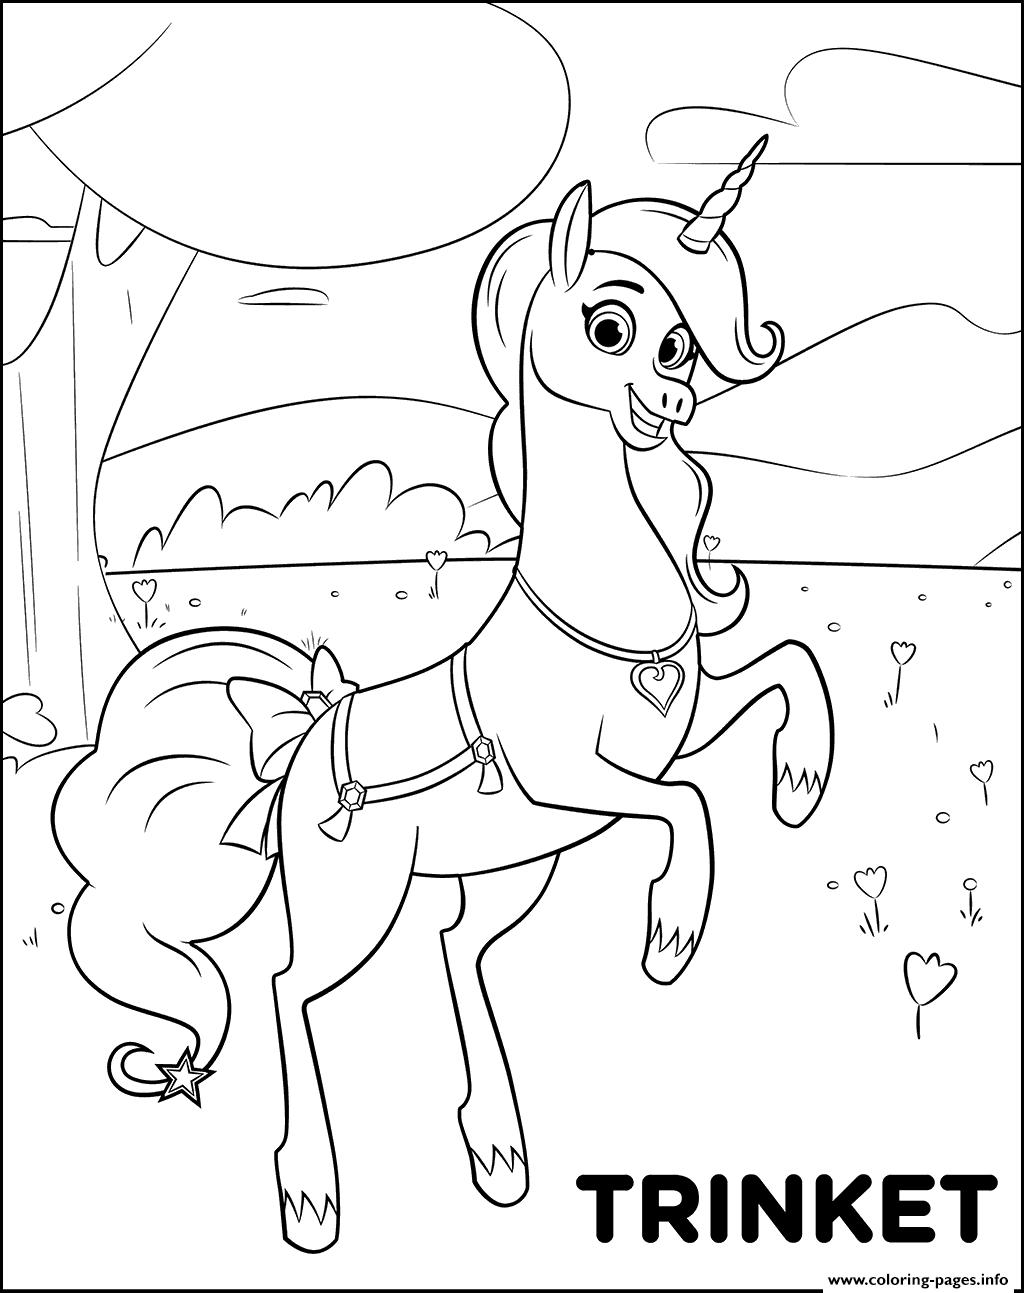 Print Magical Pet Unicorn Trinket For Girls Coloring Pages Unicorn Coloring Pages Cartoon Coloring Pages Princess Coloring Pages